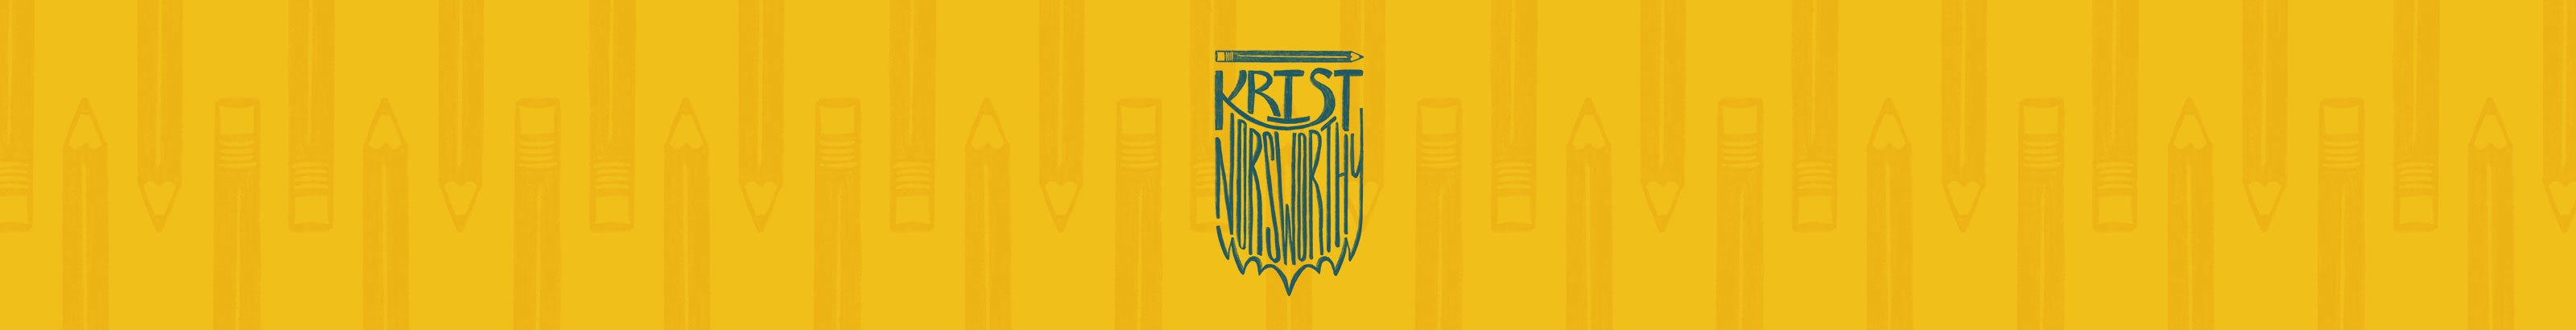 kristnorsworthy Cover